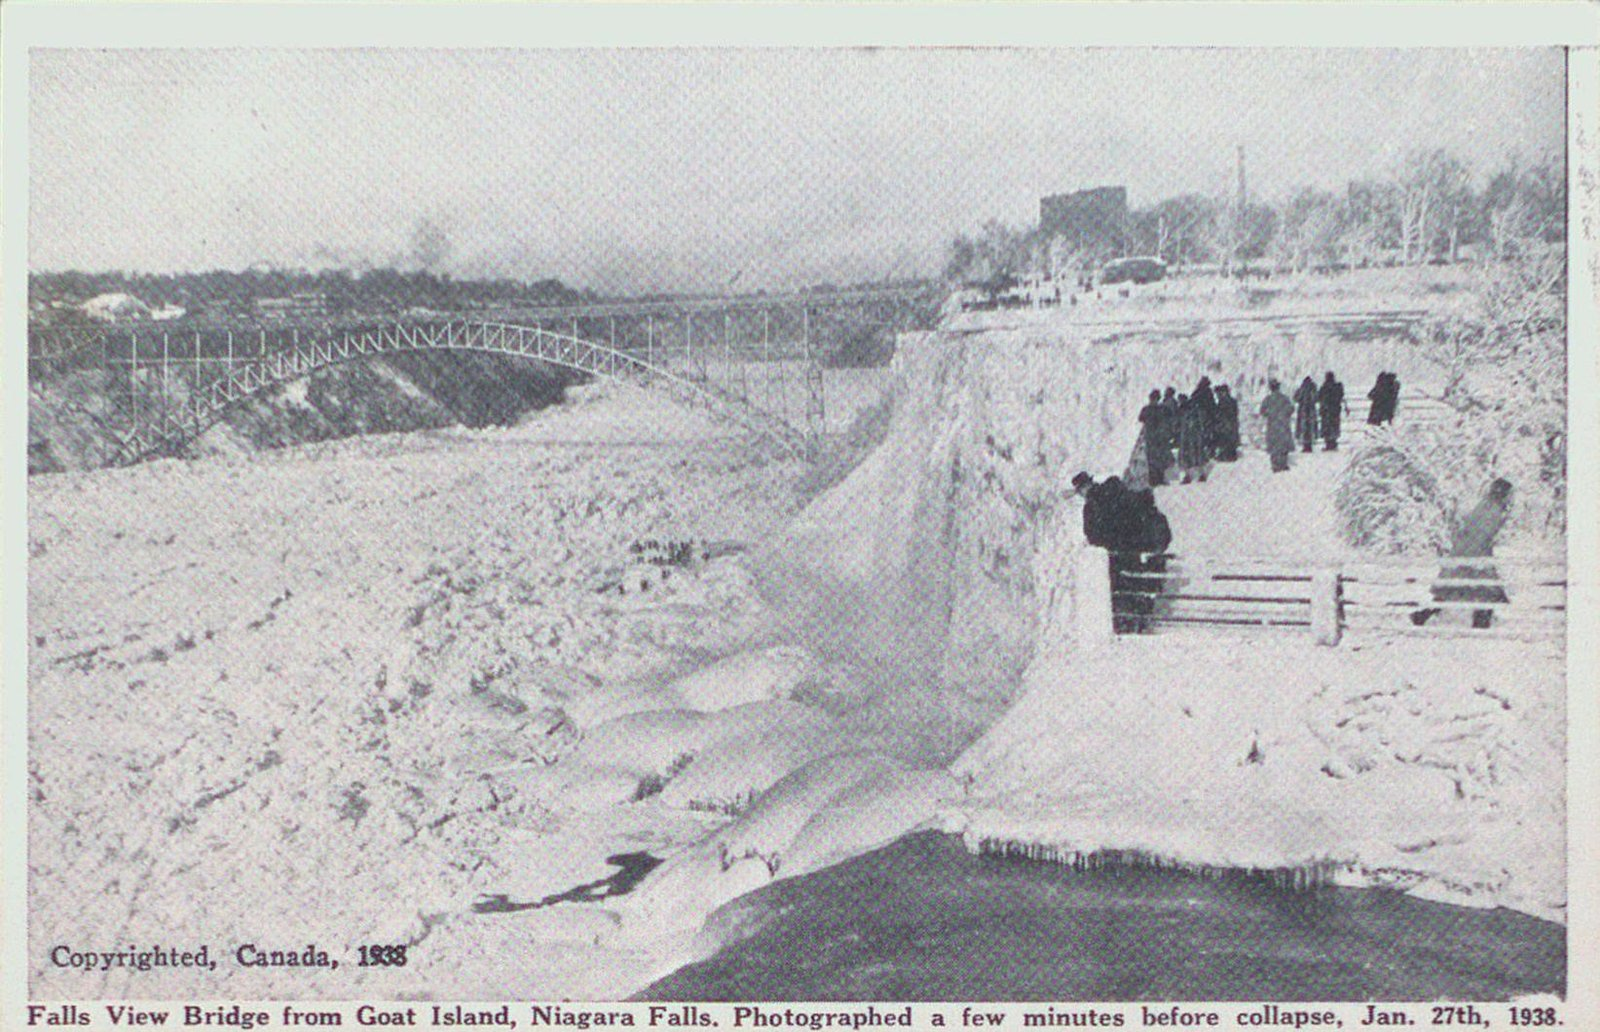 Falls View Bridge Just Before Collapse, Niagara Falls